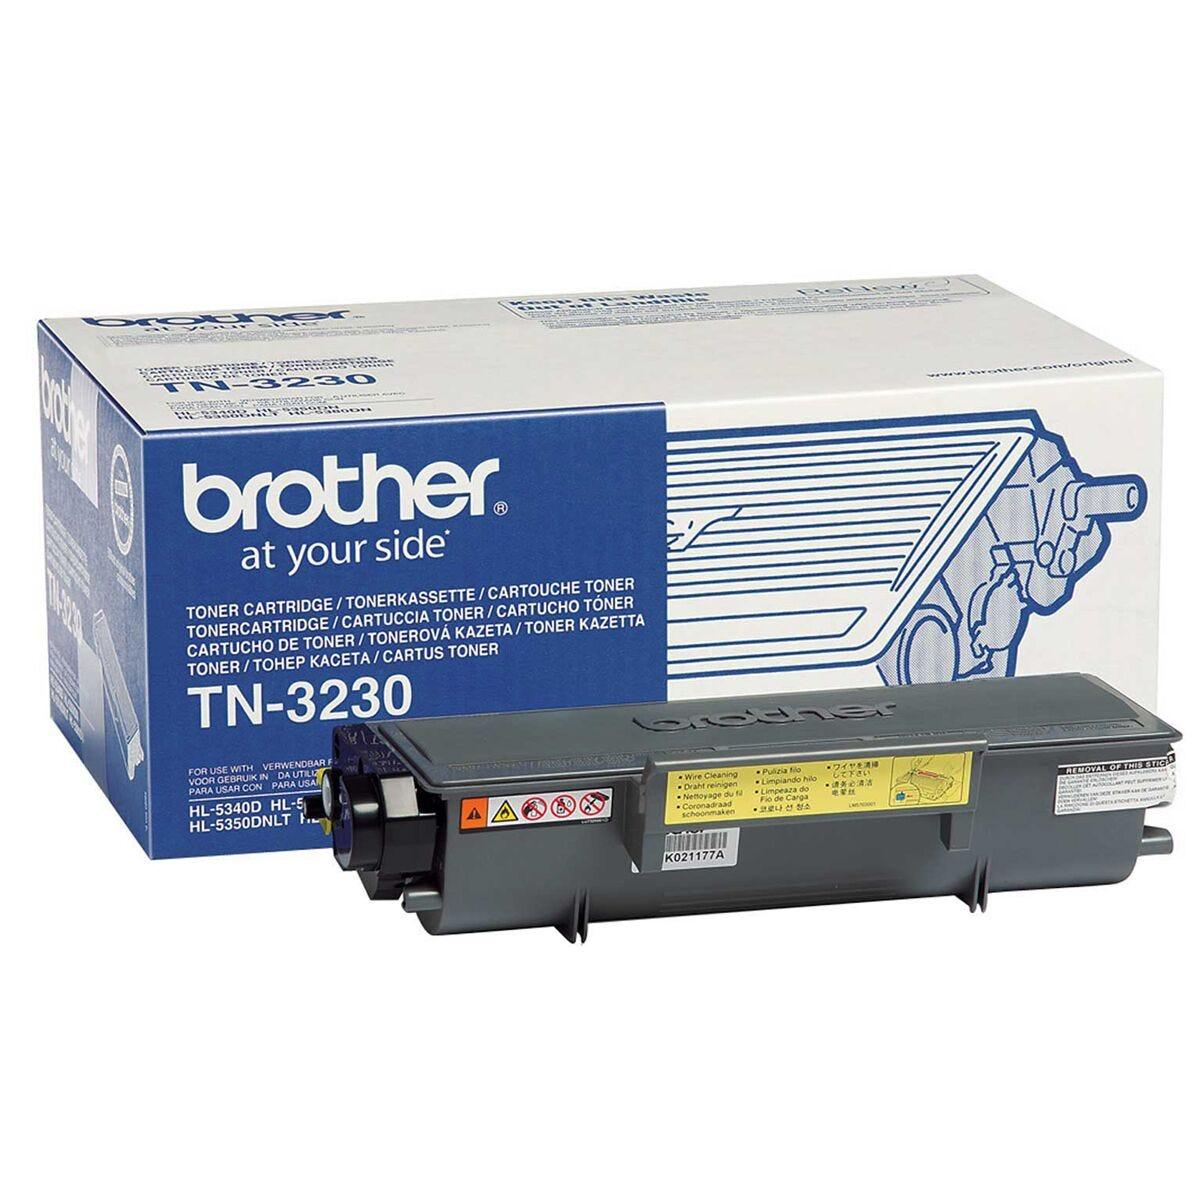 Brother TN3230 Mono Ink Printer Toner Cartridge